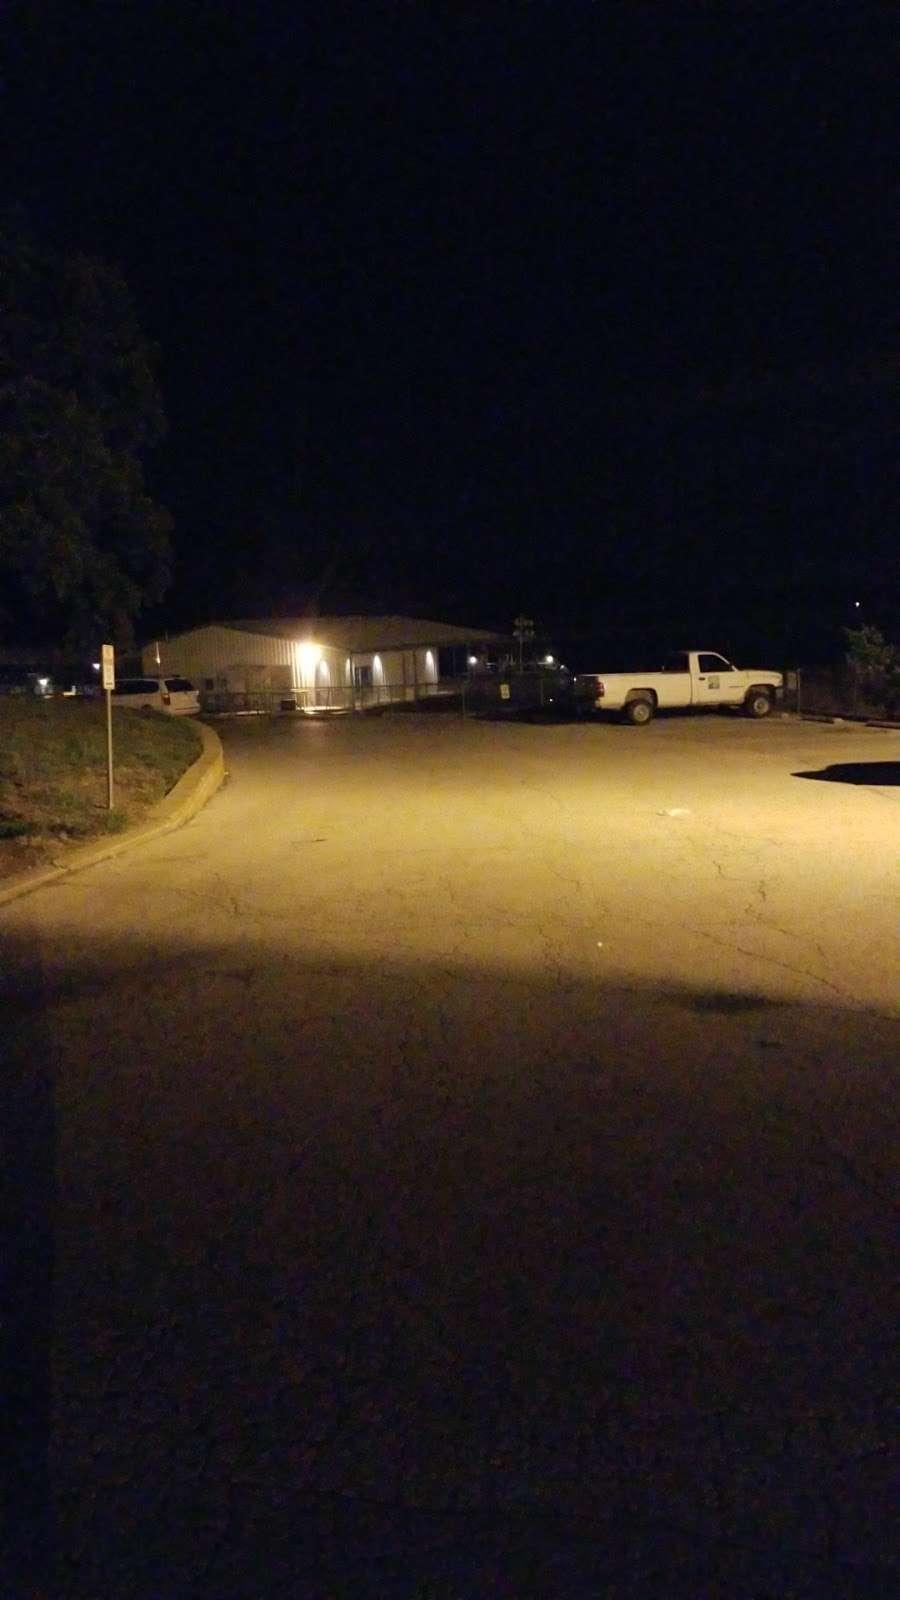 Lake Jacomo Shelter - park  | Photo 7 of 7 | Address: 7401 W Park Rd, Blue Springs, MO 64015, USA | Phone: (816) 795-8888